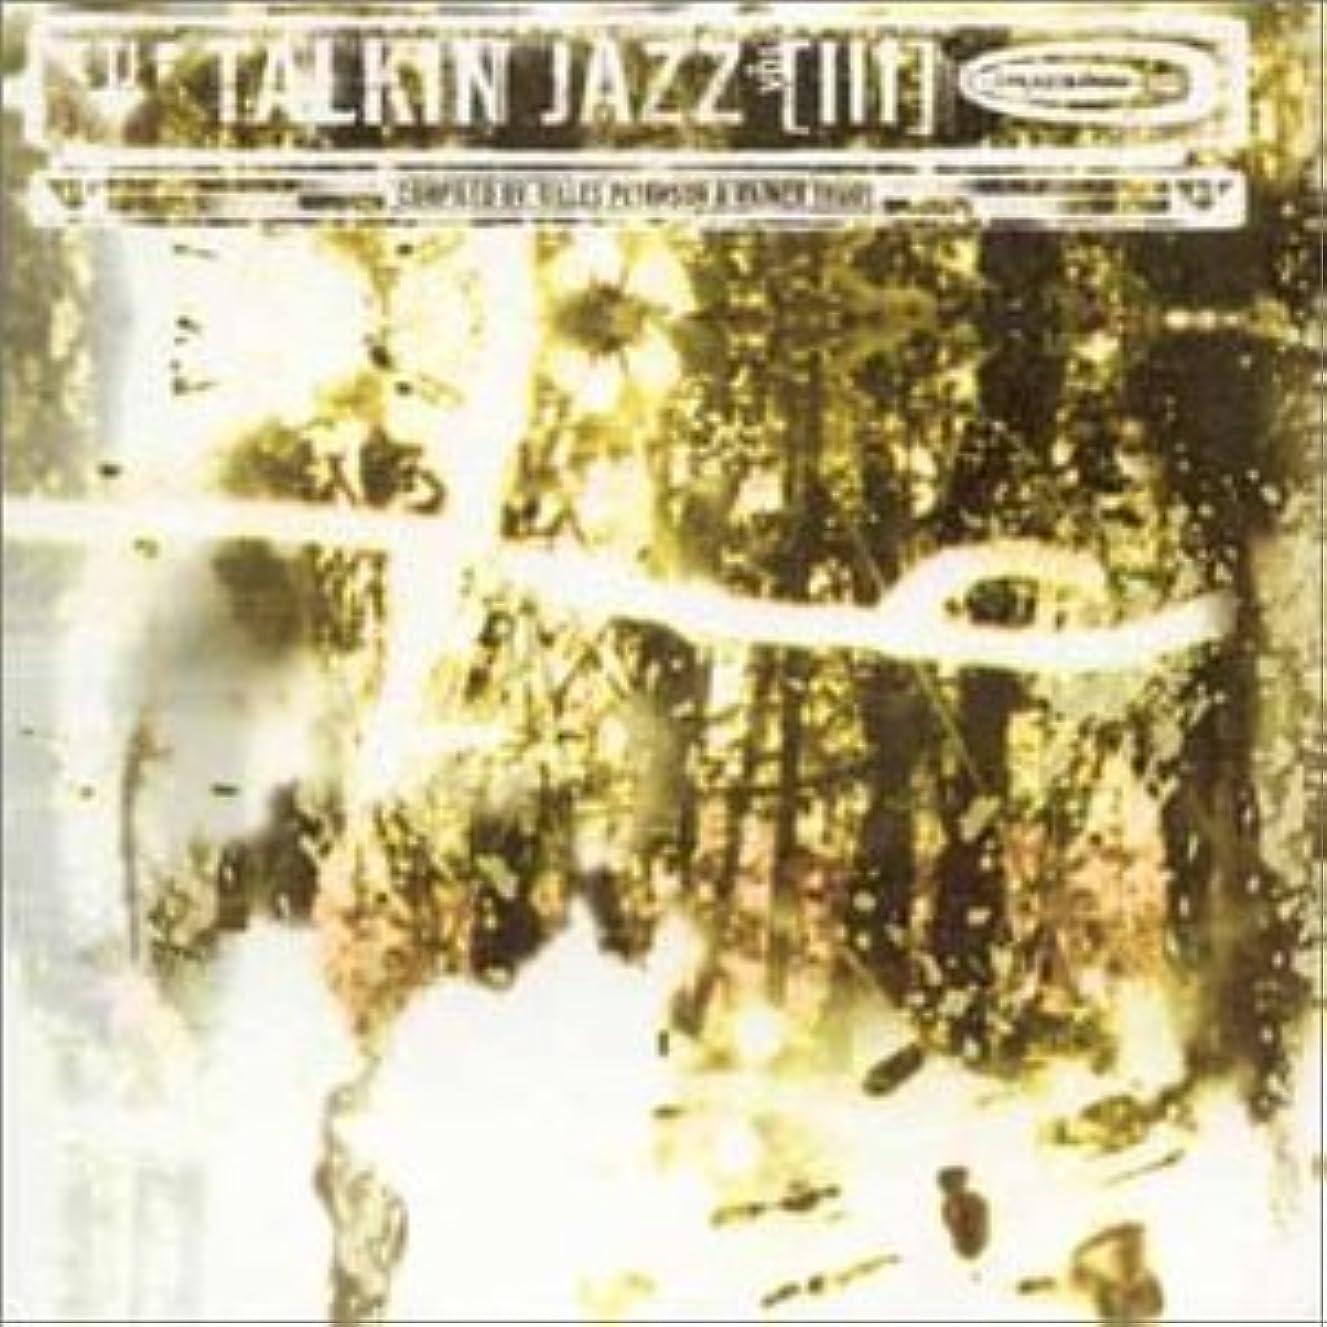 Talkin Jazz 3